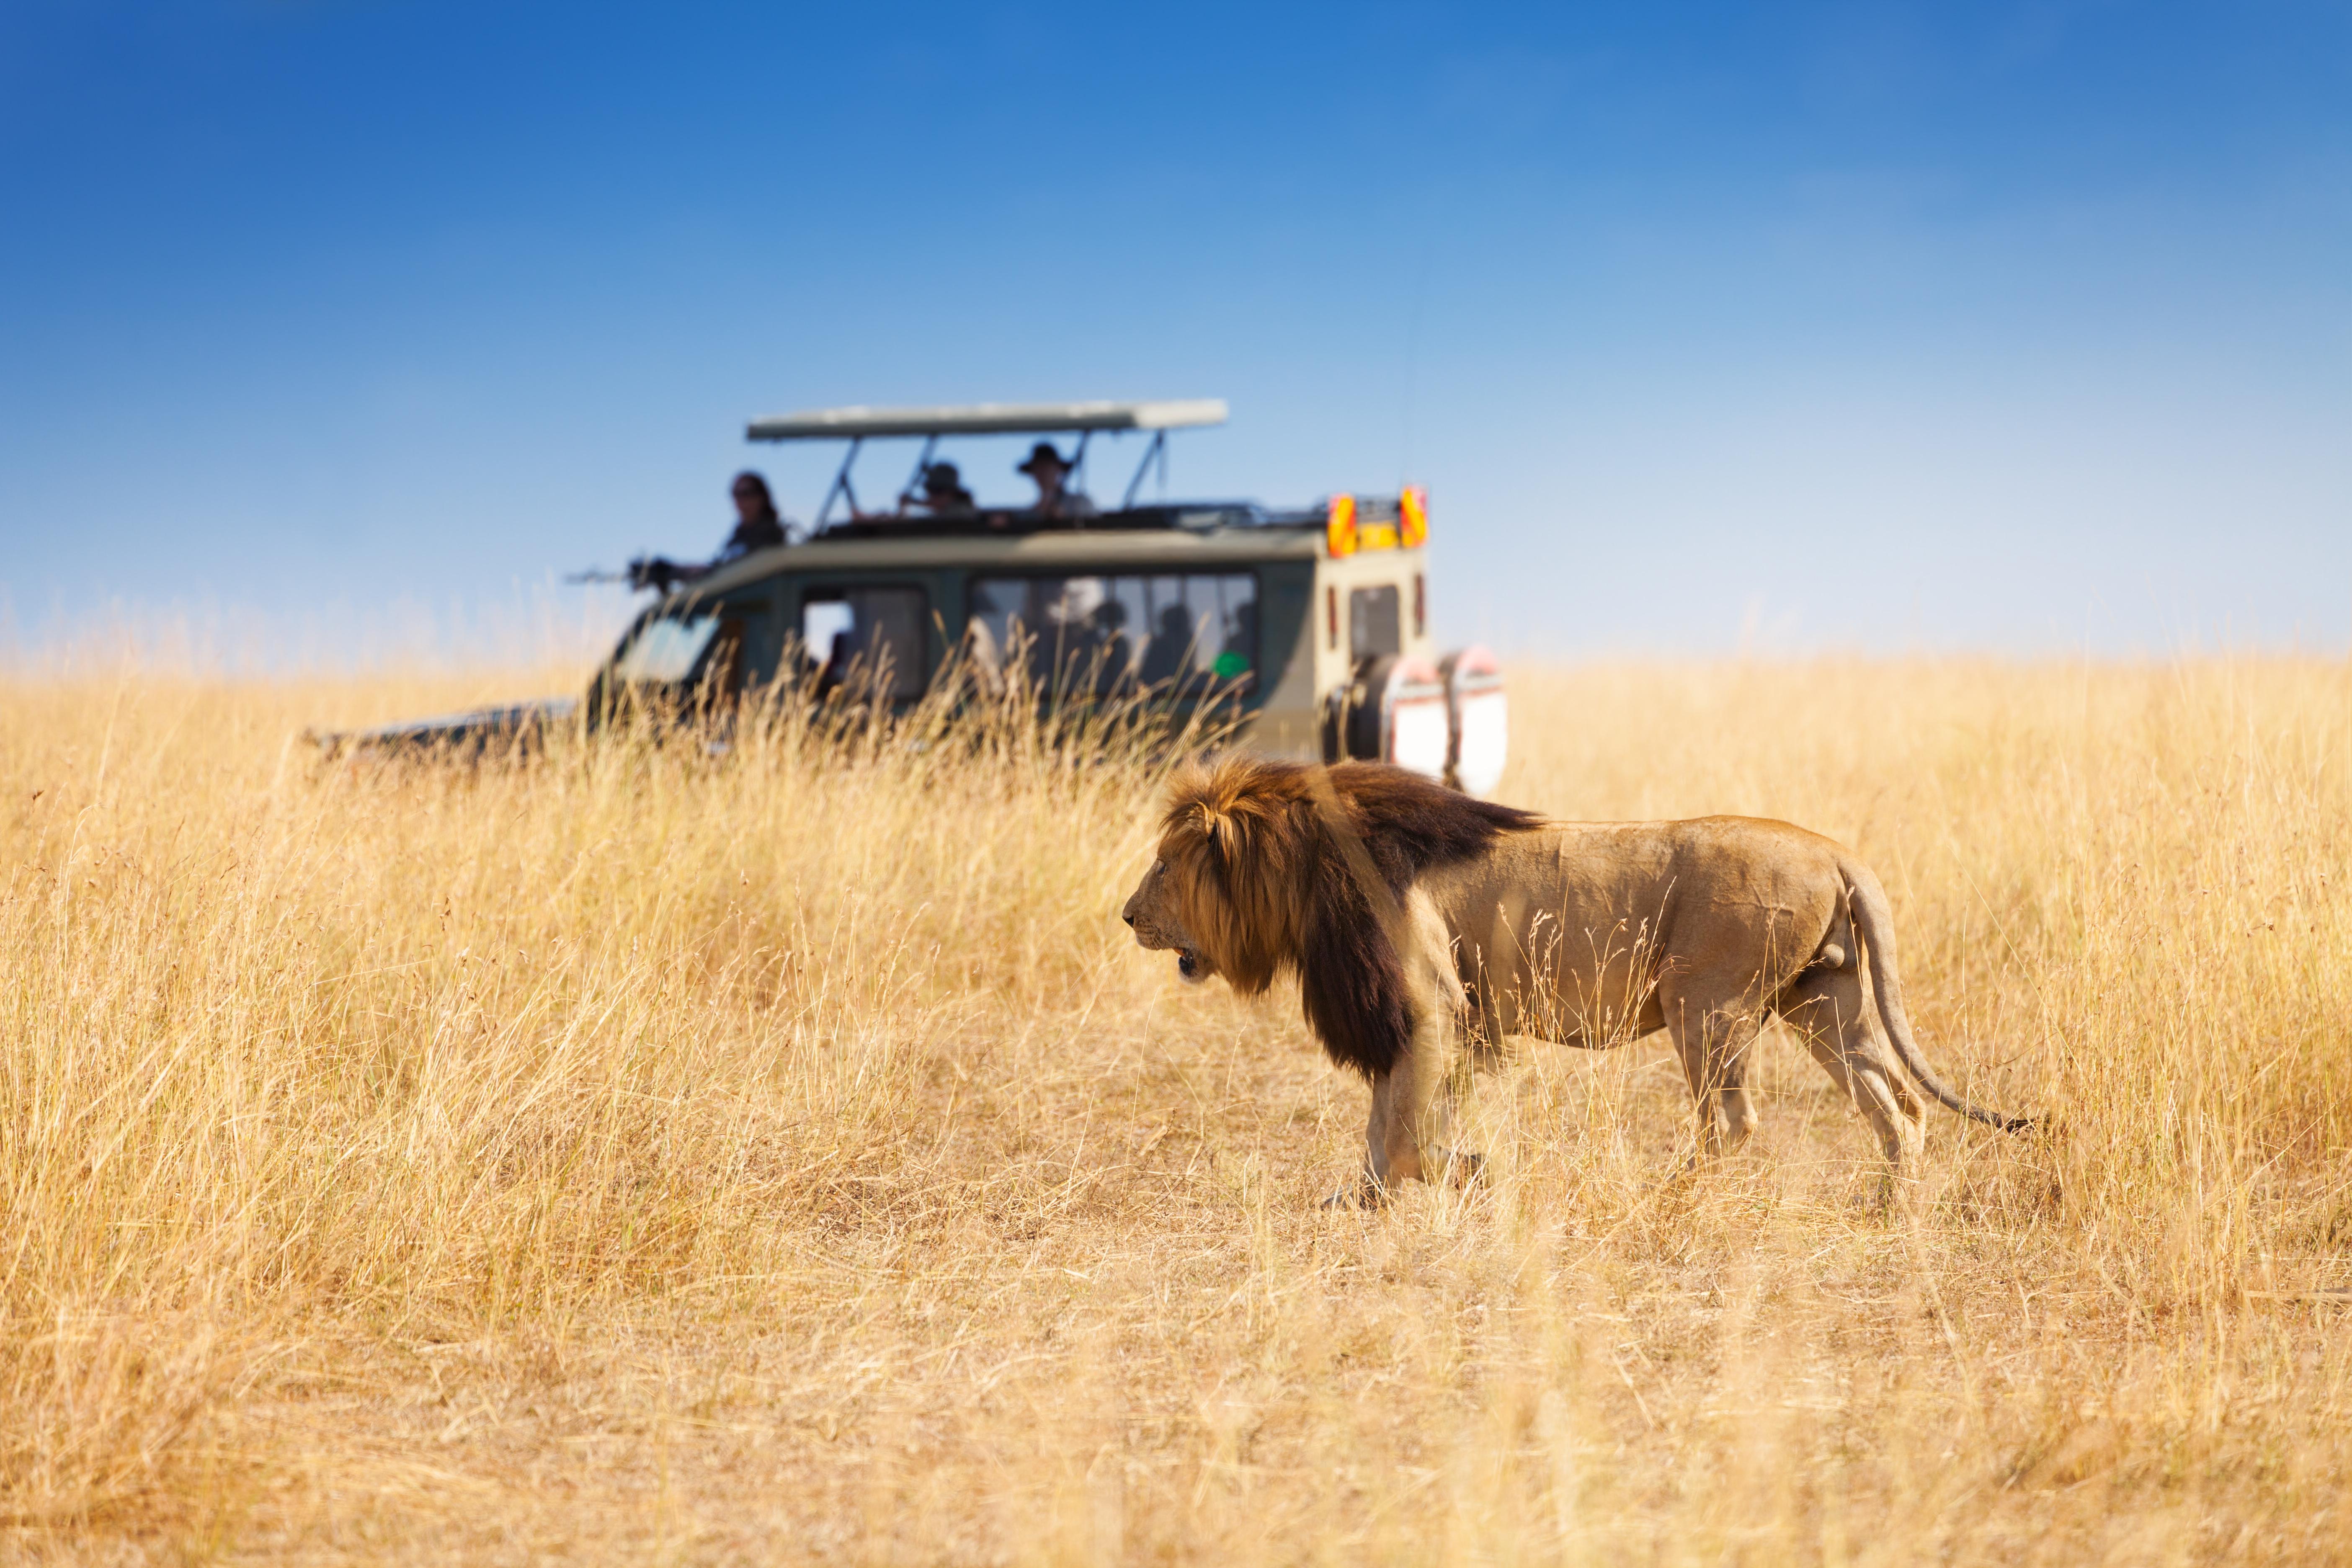 Löwe auf Safari